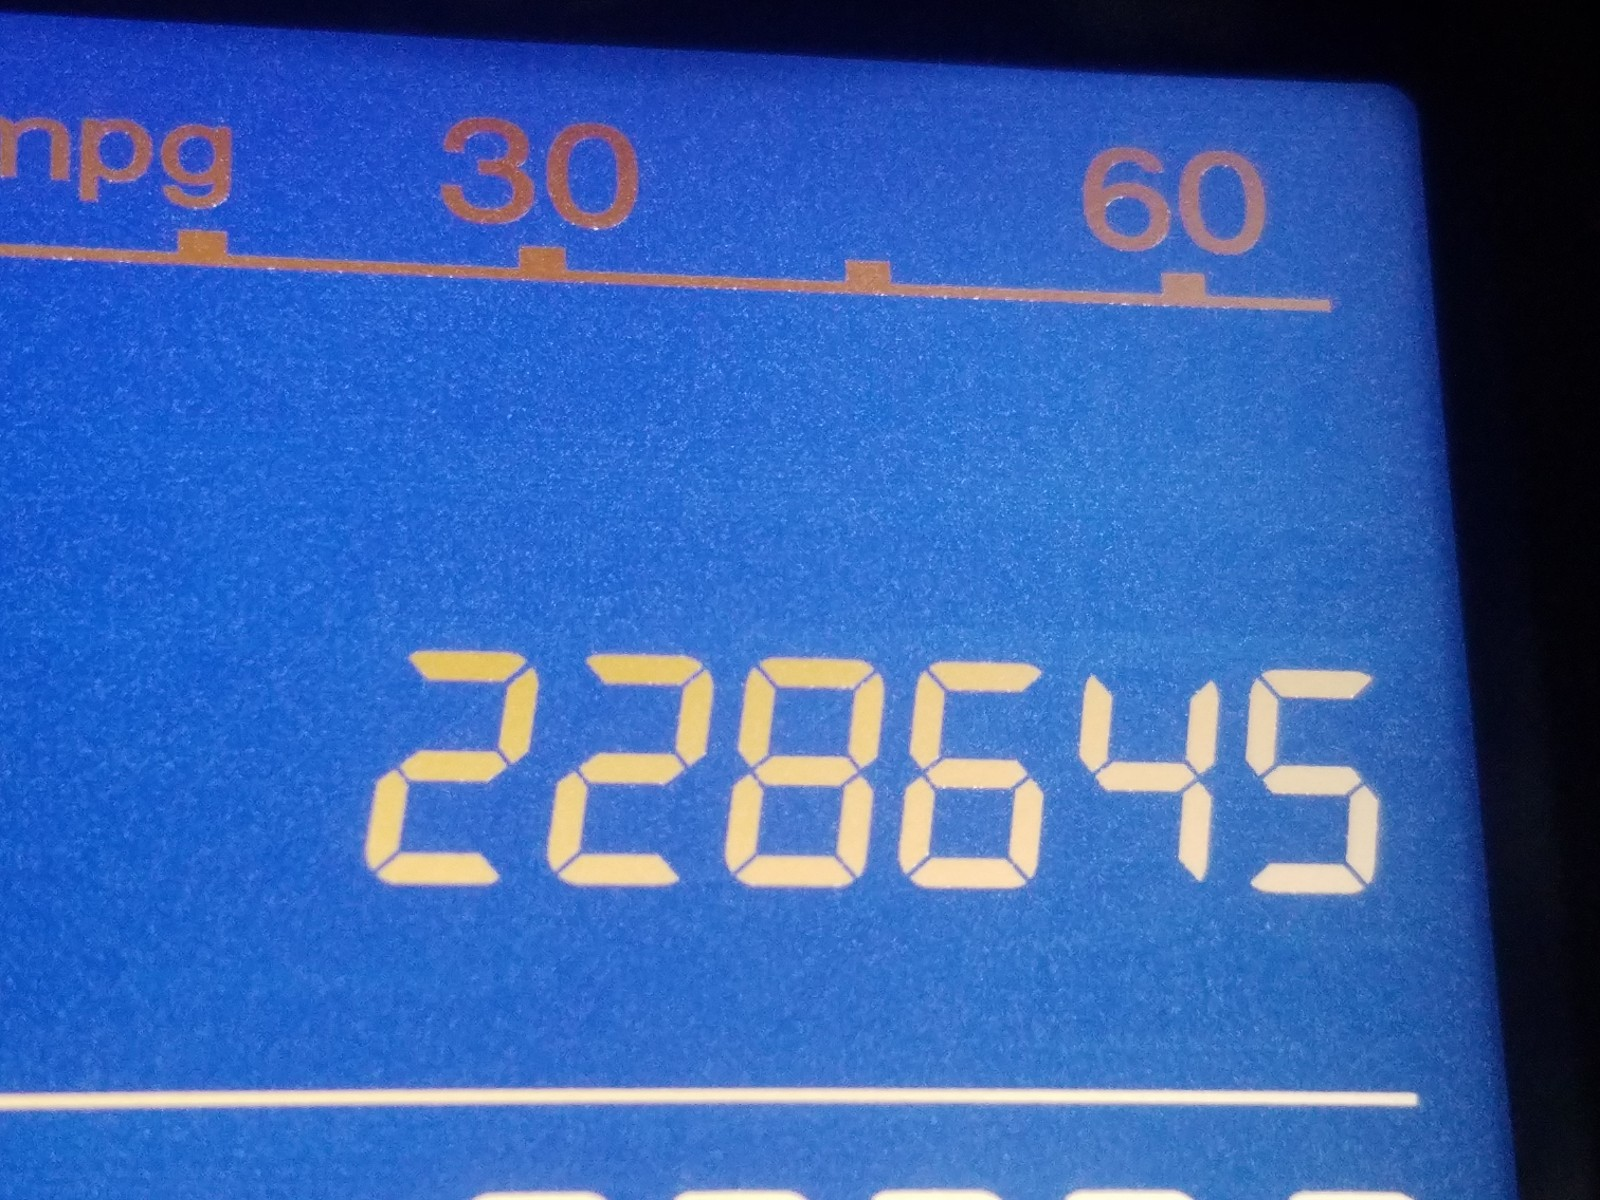 3CZRE4H5XAG700888 - 2010 Honda Cr-V Ex 2.4L front view